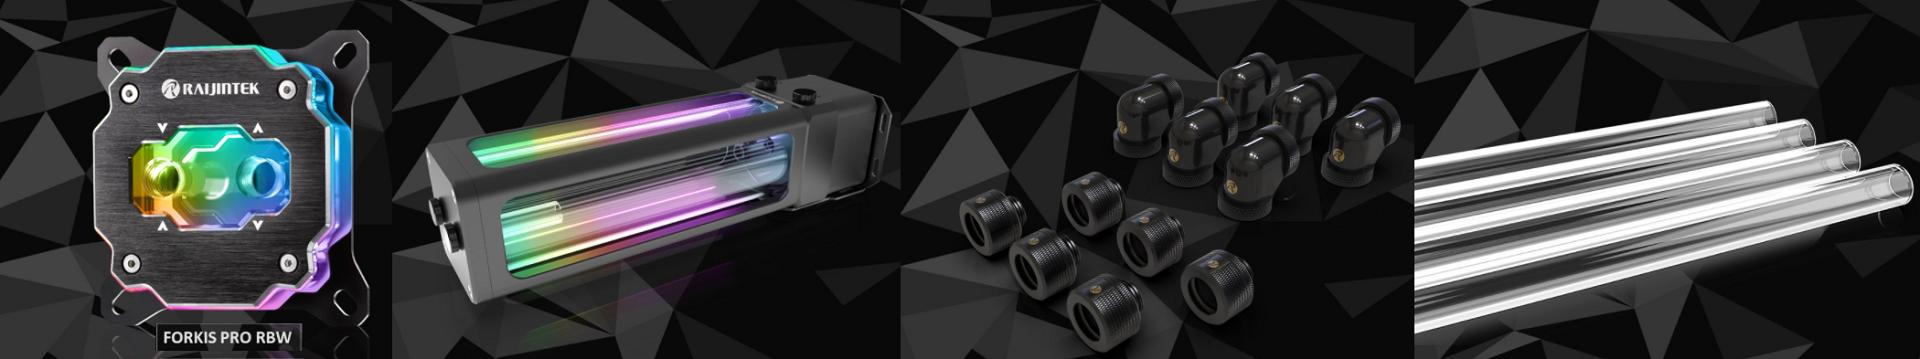 Raijintek présente ses nouveaux kit watercooling custom Scylla Pro CA240/CA360